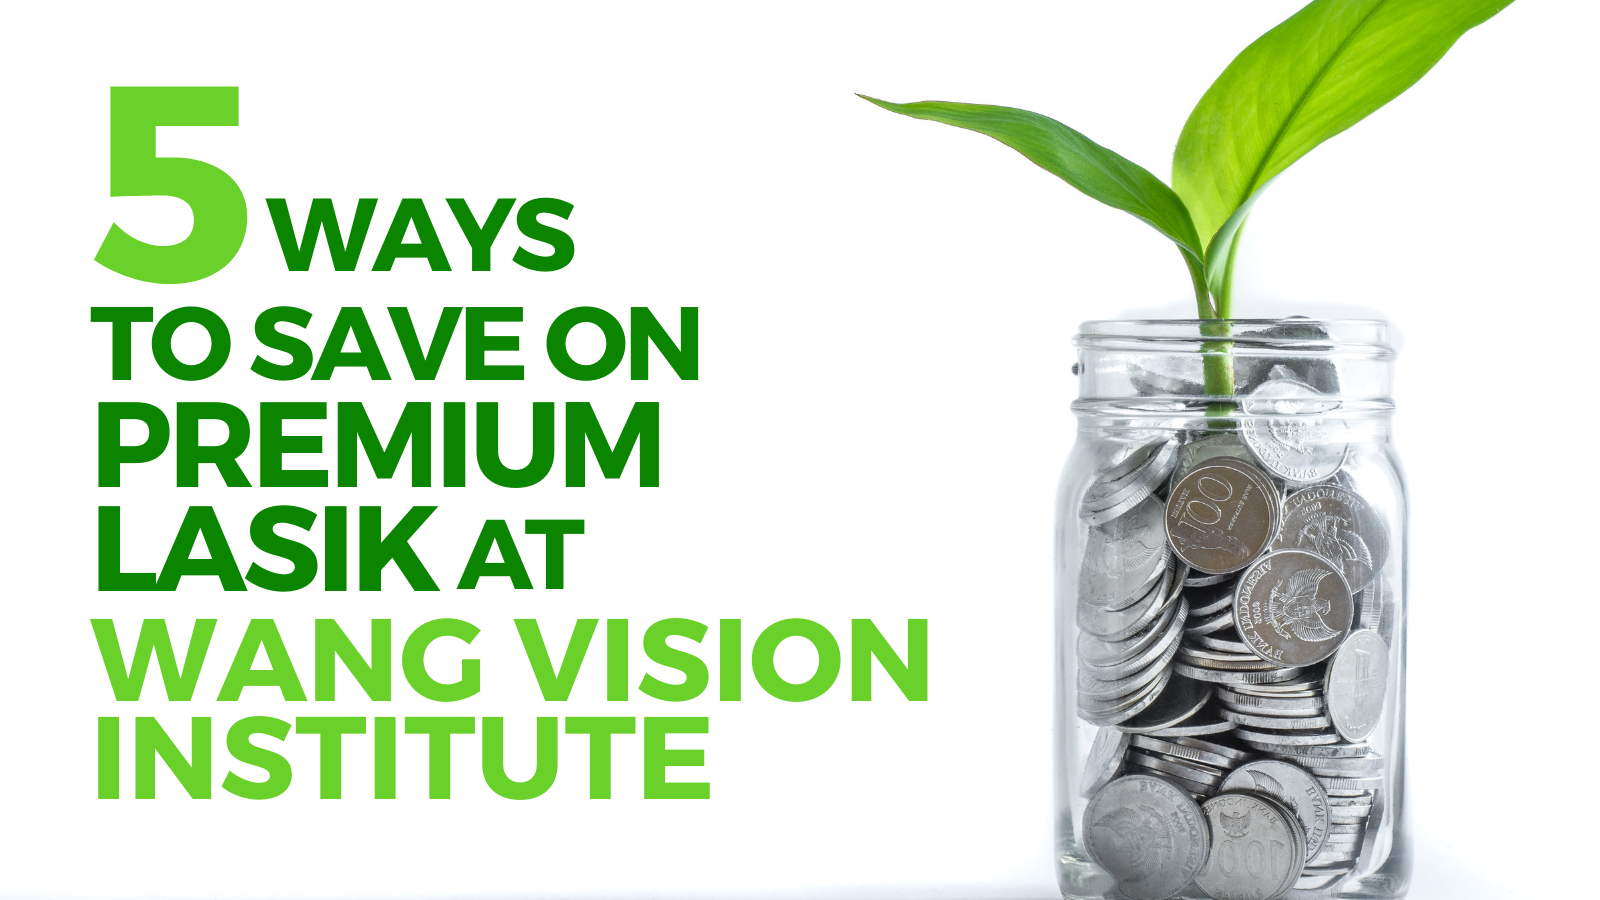 5 ways to make premium lasik more affordable.png